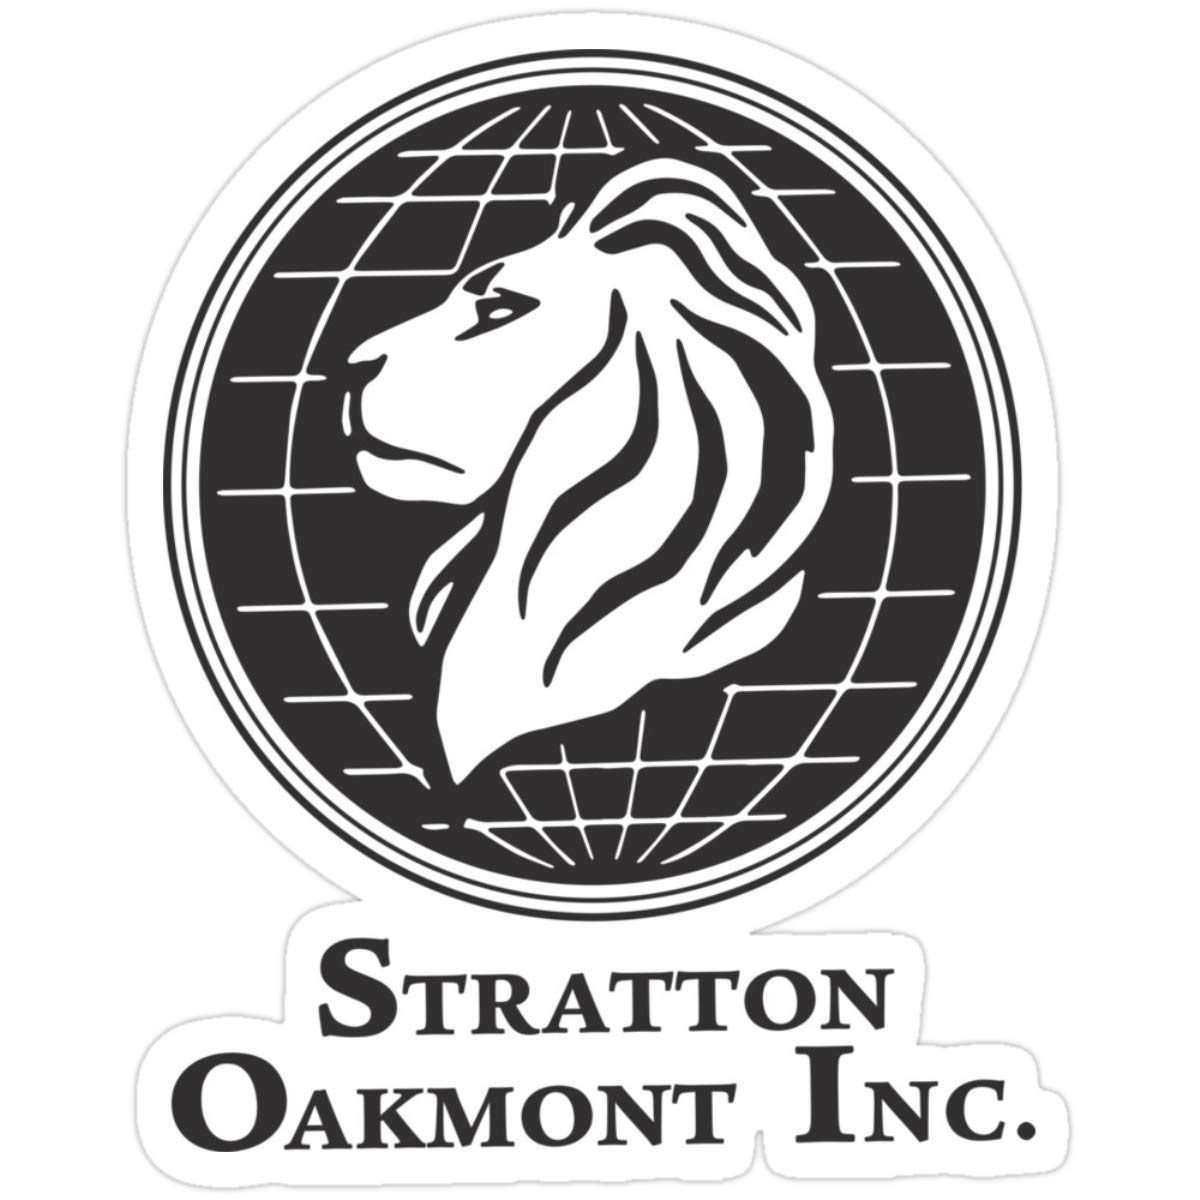 Stickers Stratton Oakmont T-Shirt Wolf Of Wall Street Tshirt Jordan Belfort Ludes T Shirt Movie Cult Gift Martin Scorsese Him Her Logo Stock Market (3 Pcs/pack) Water Bottle Decals 3x4 Inch: Amazon.es: